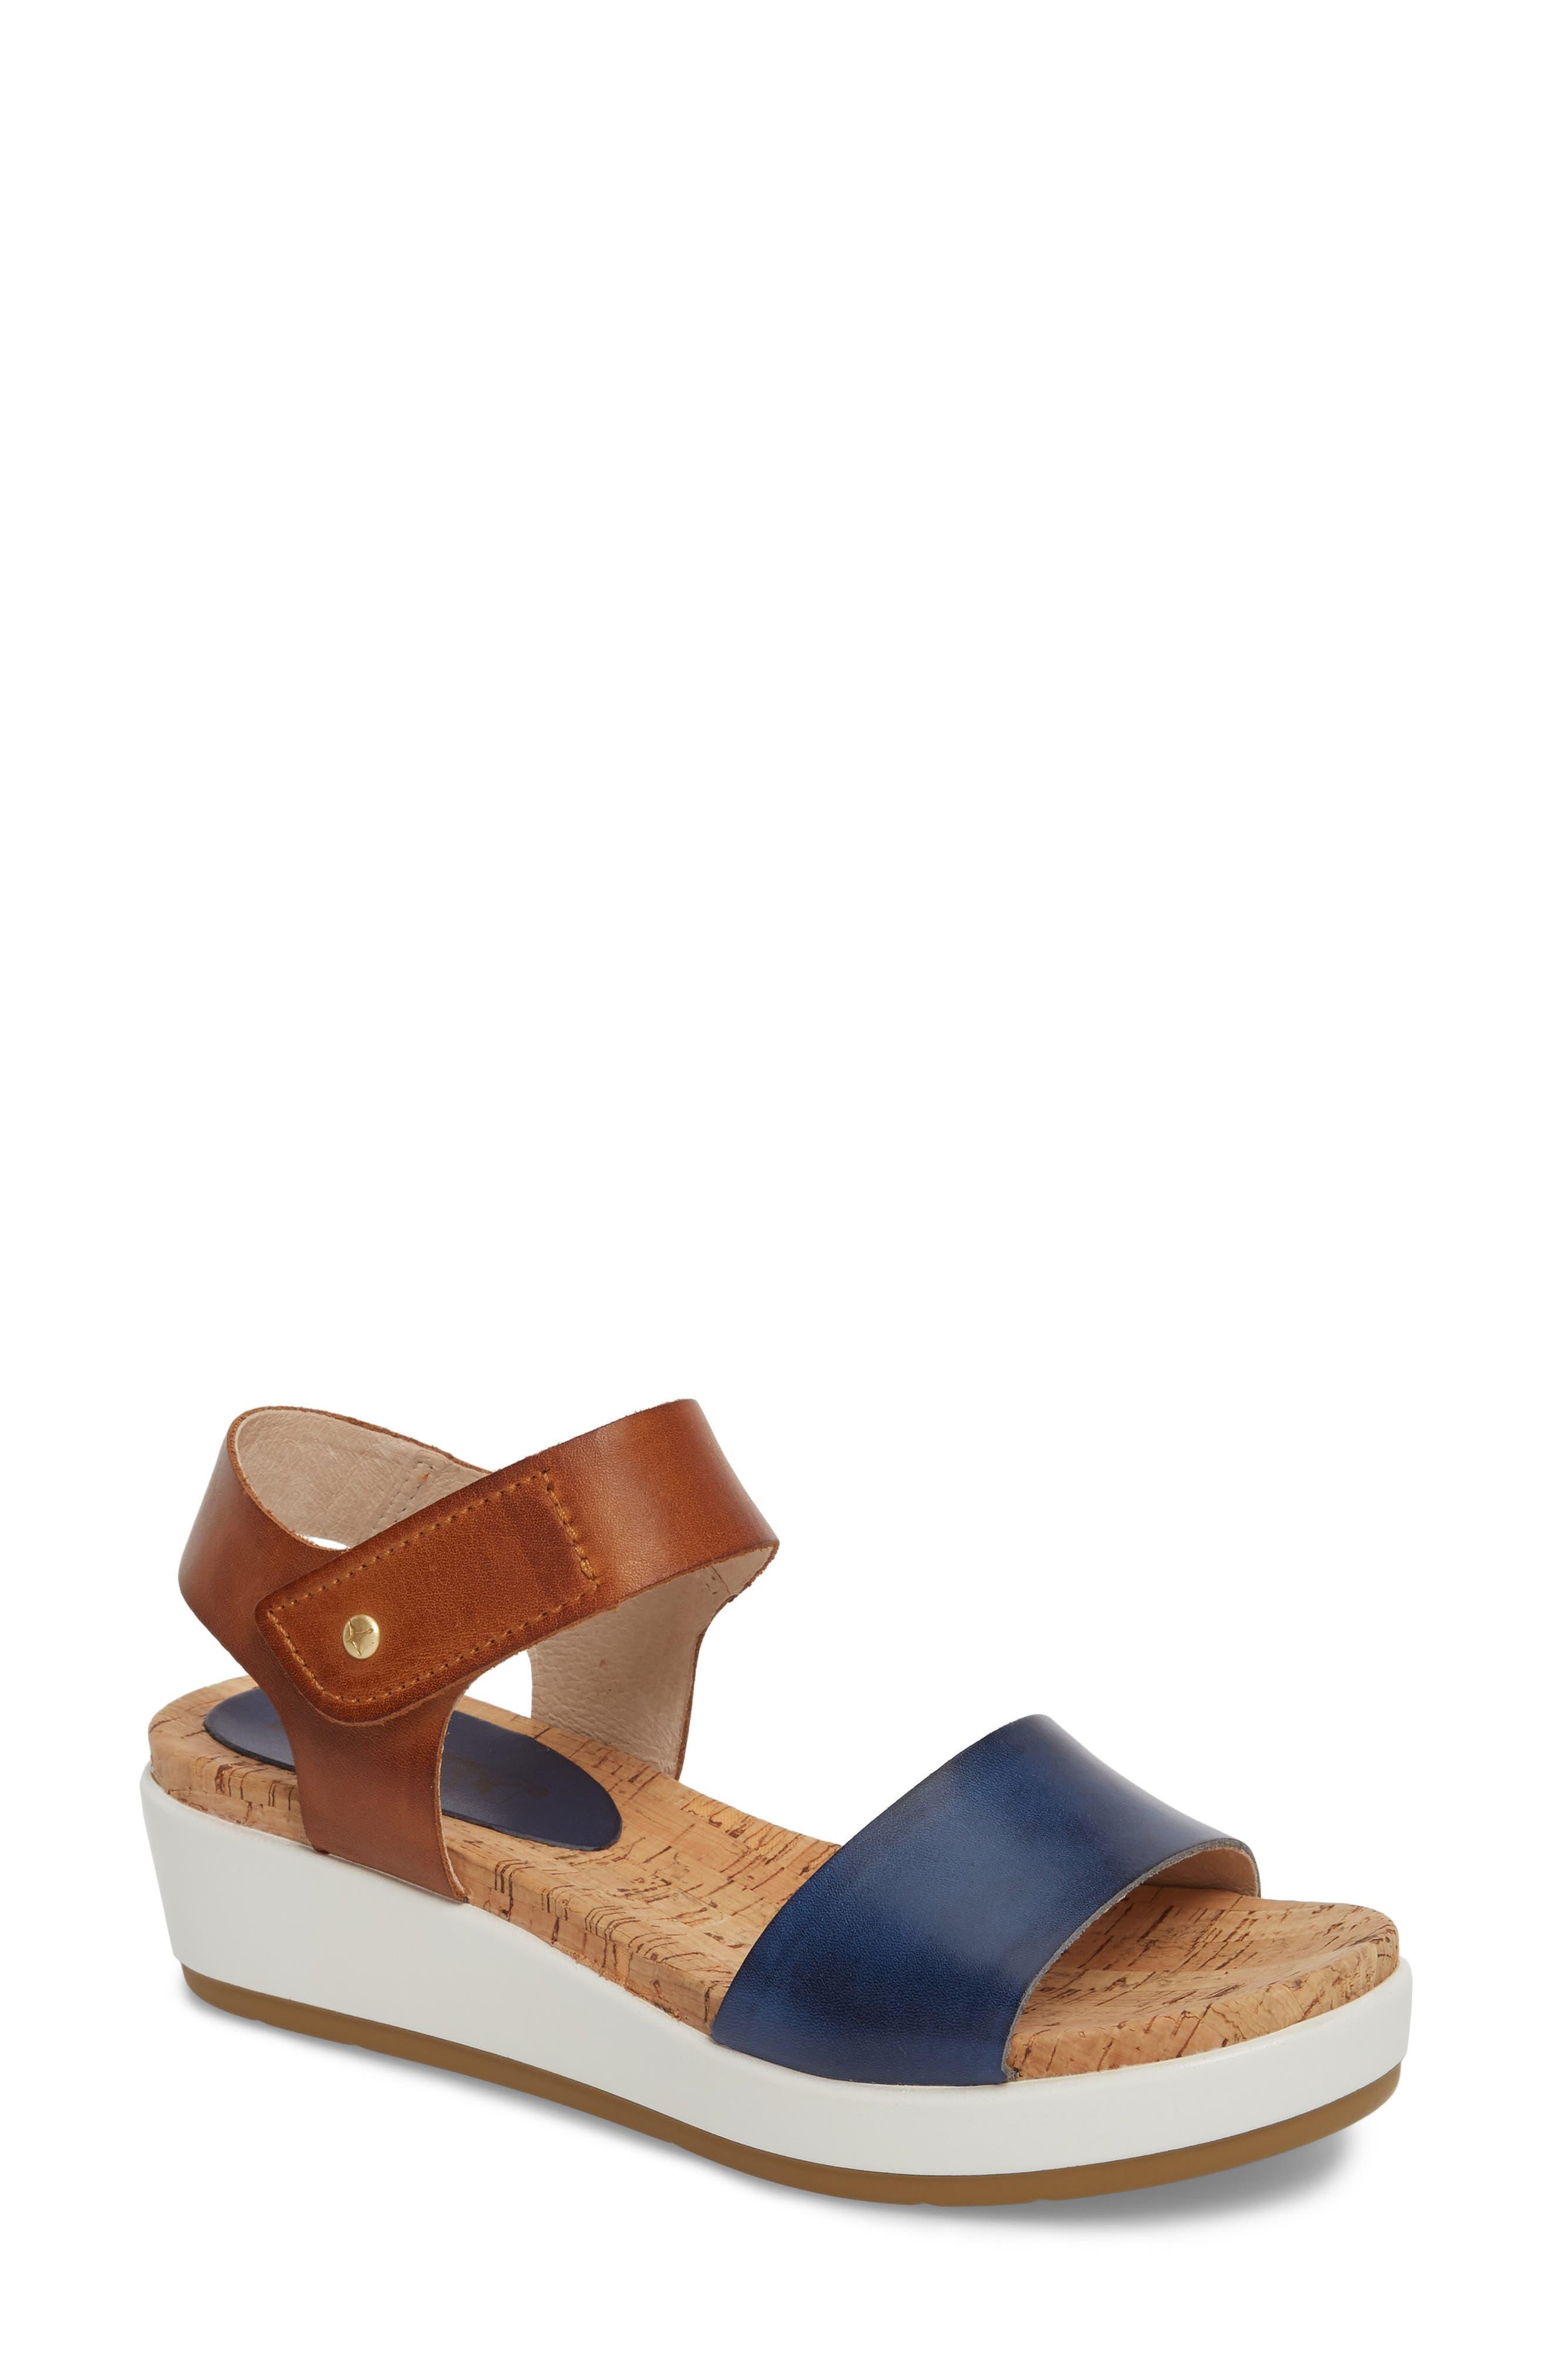 Mykonos Sport Sandal,                         Main,                         color, Royal Blue Leather